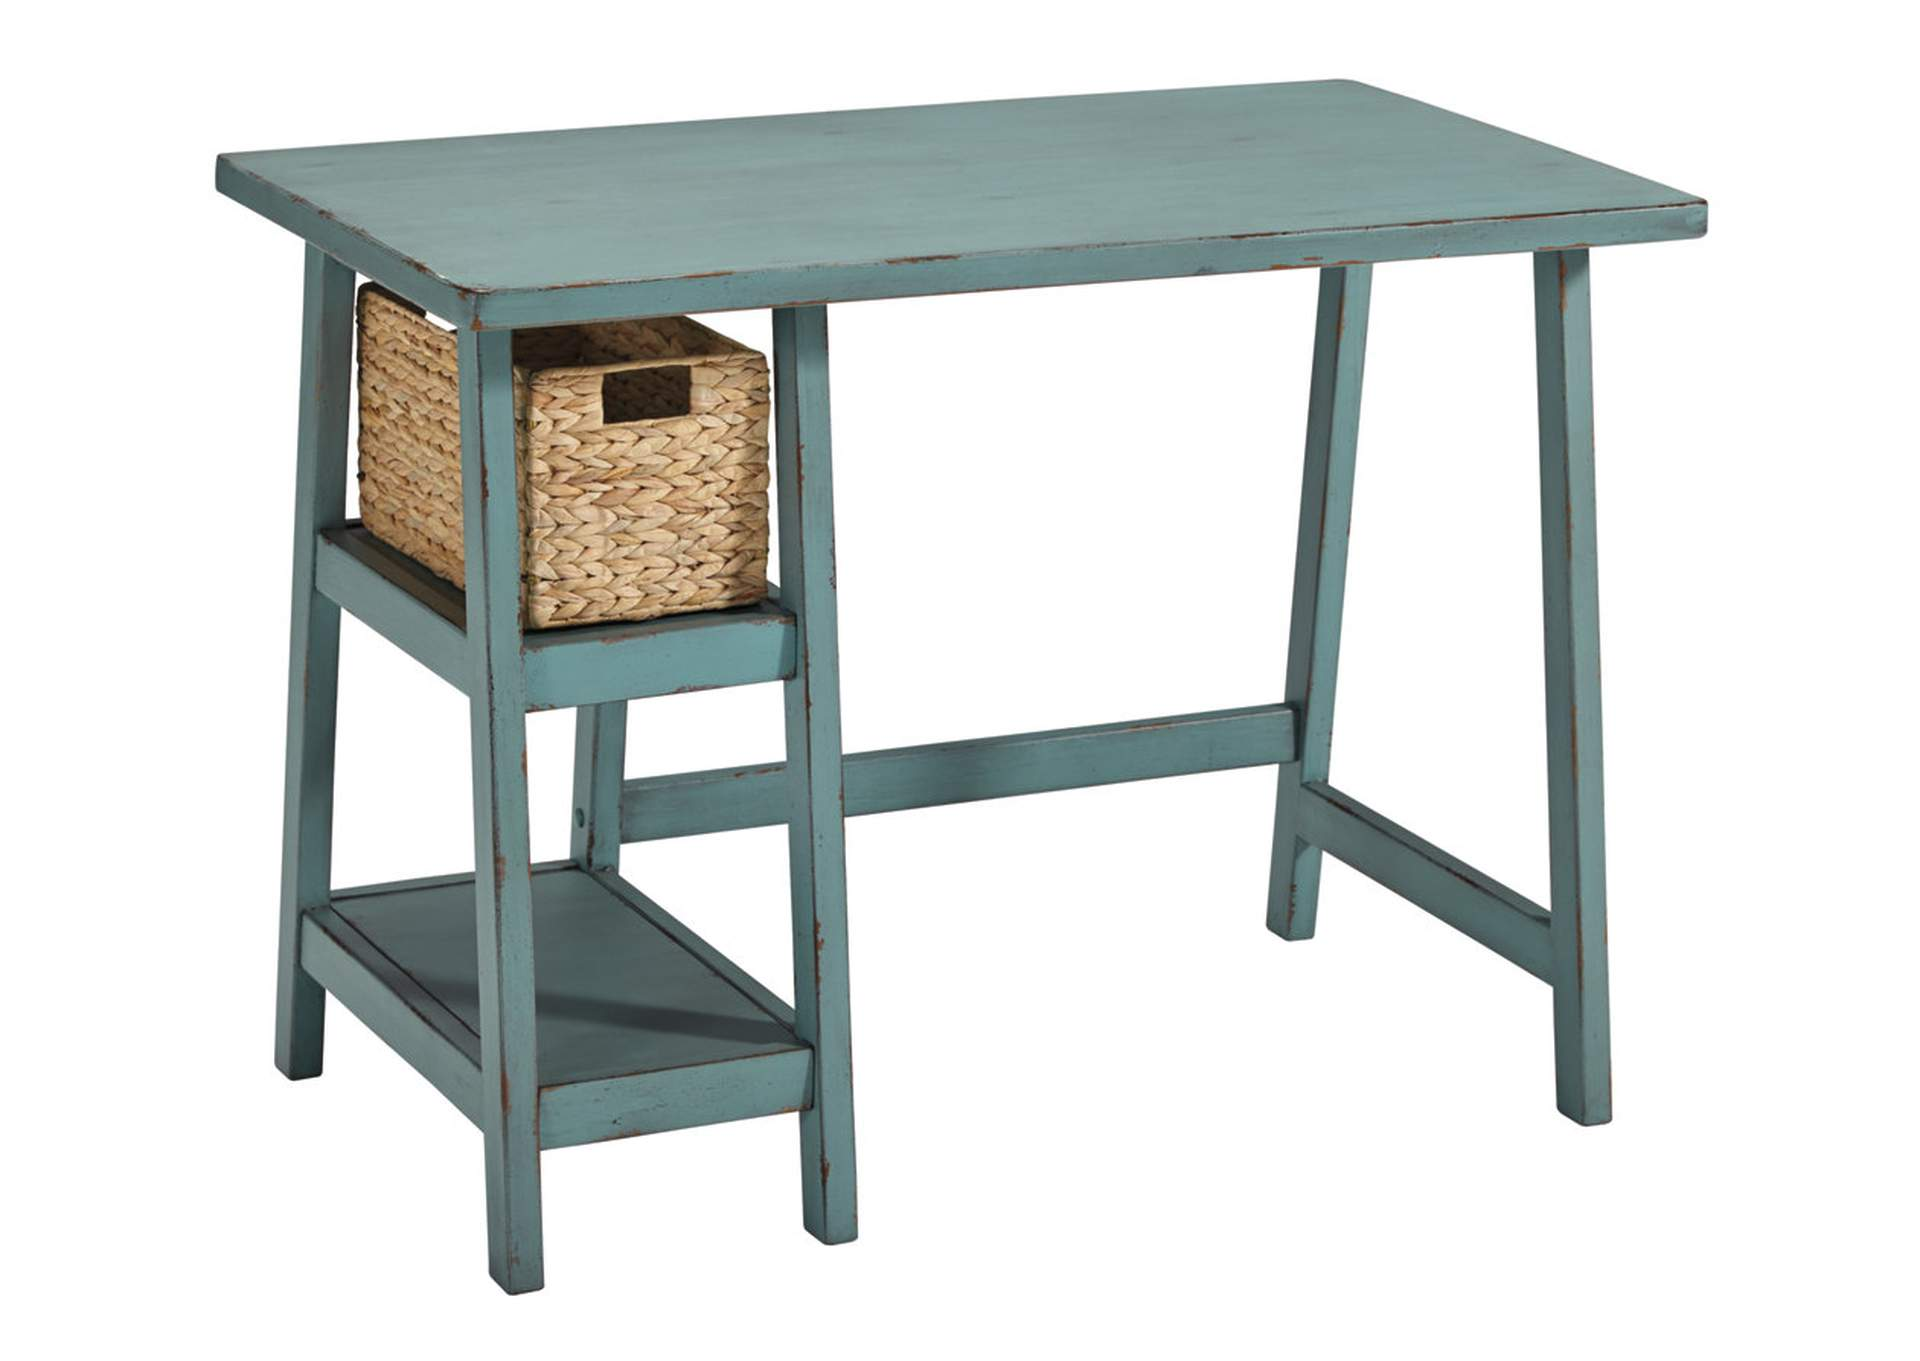 Kensington Furniture Mirimyn Teal Home Office Small Desk